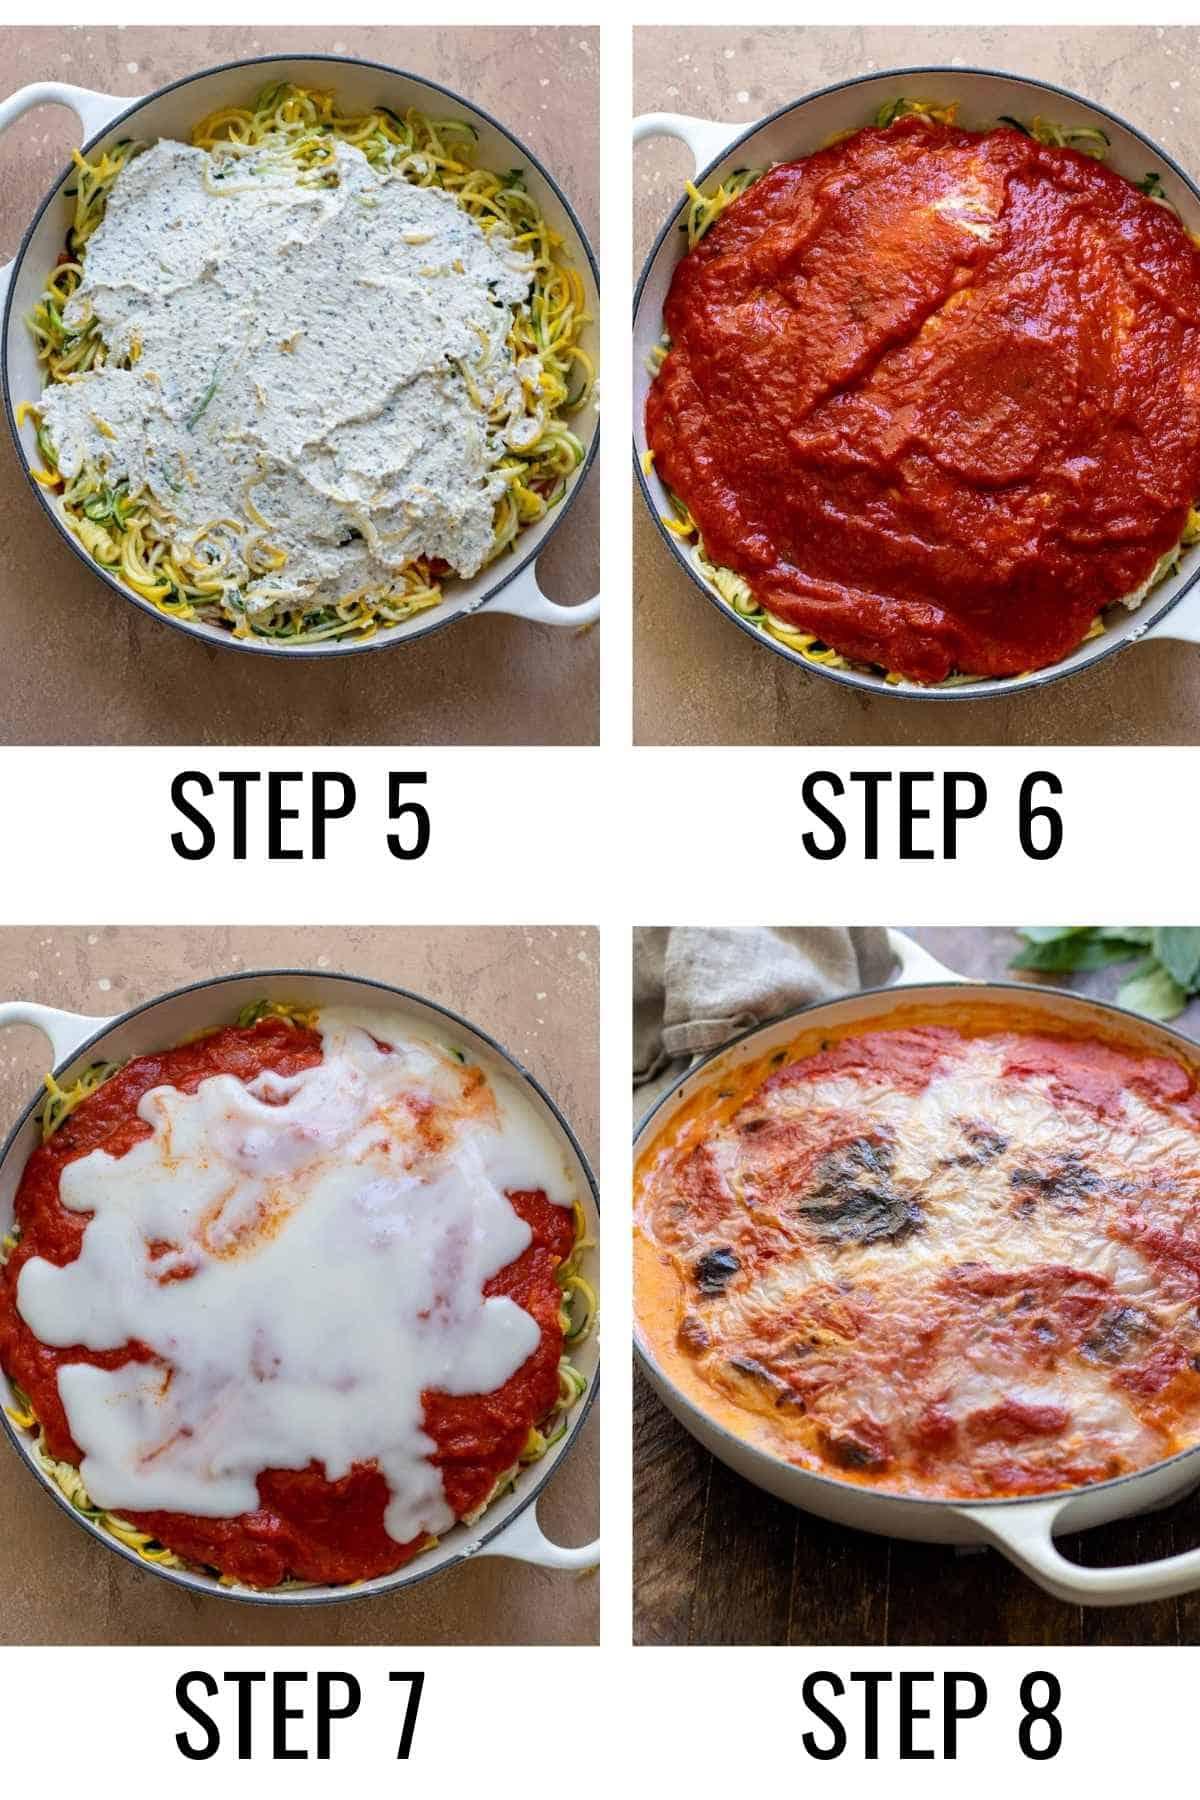 Step by step process of layering lasagna prior to baking.